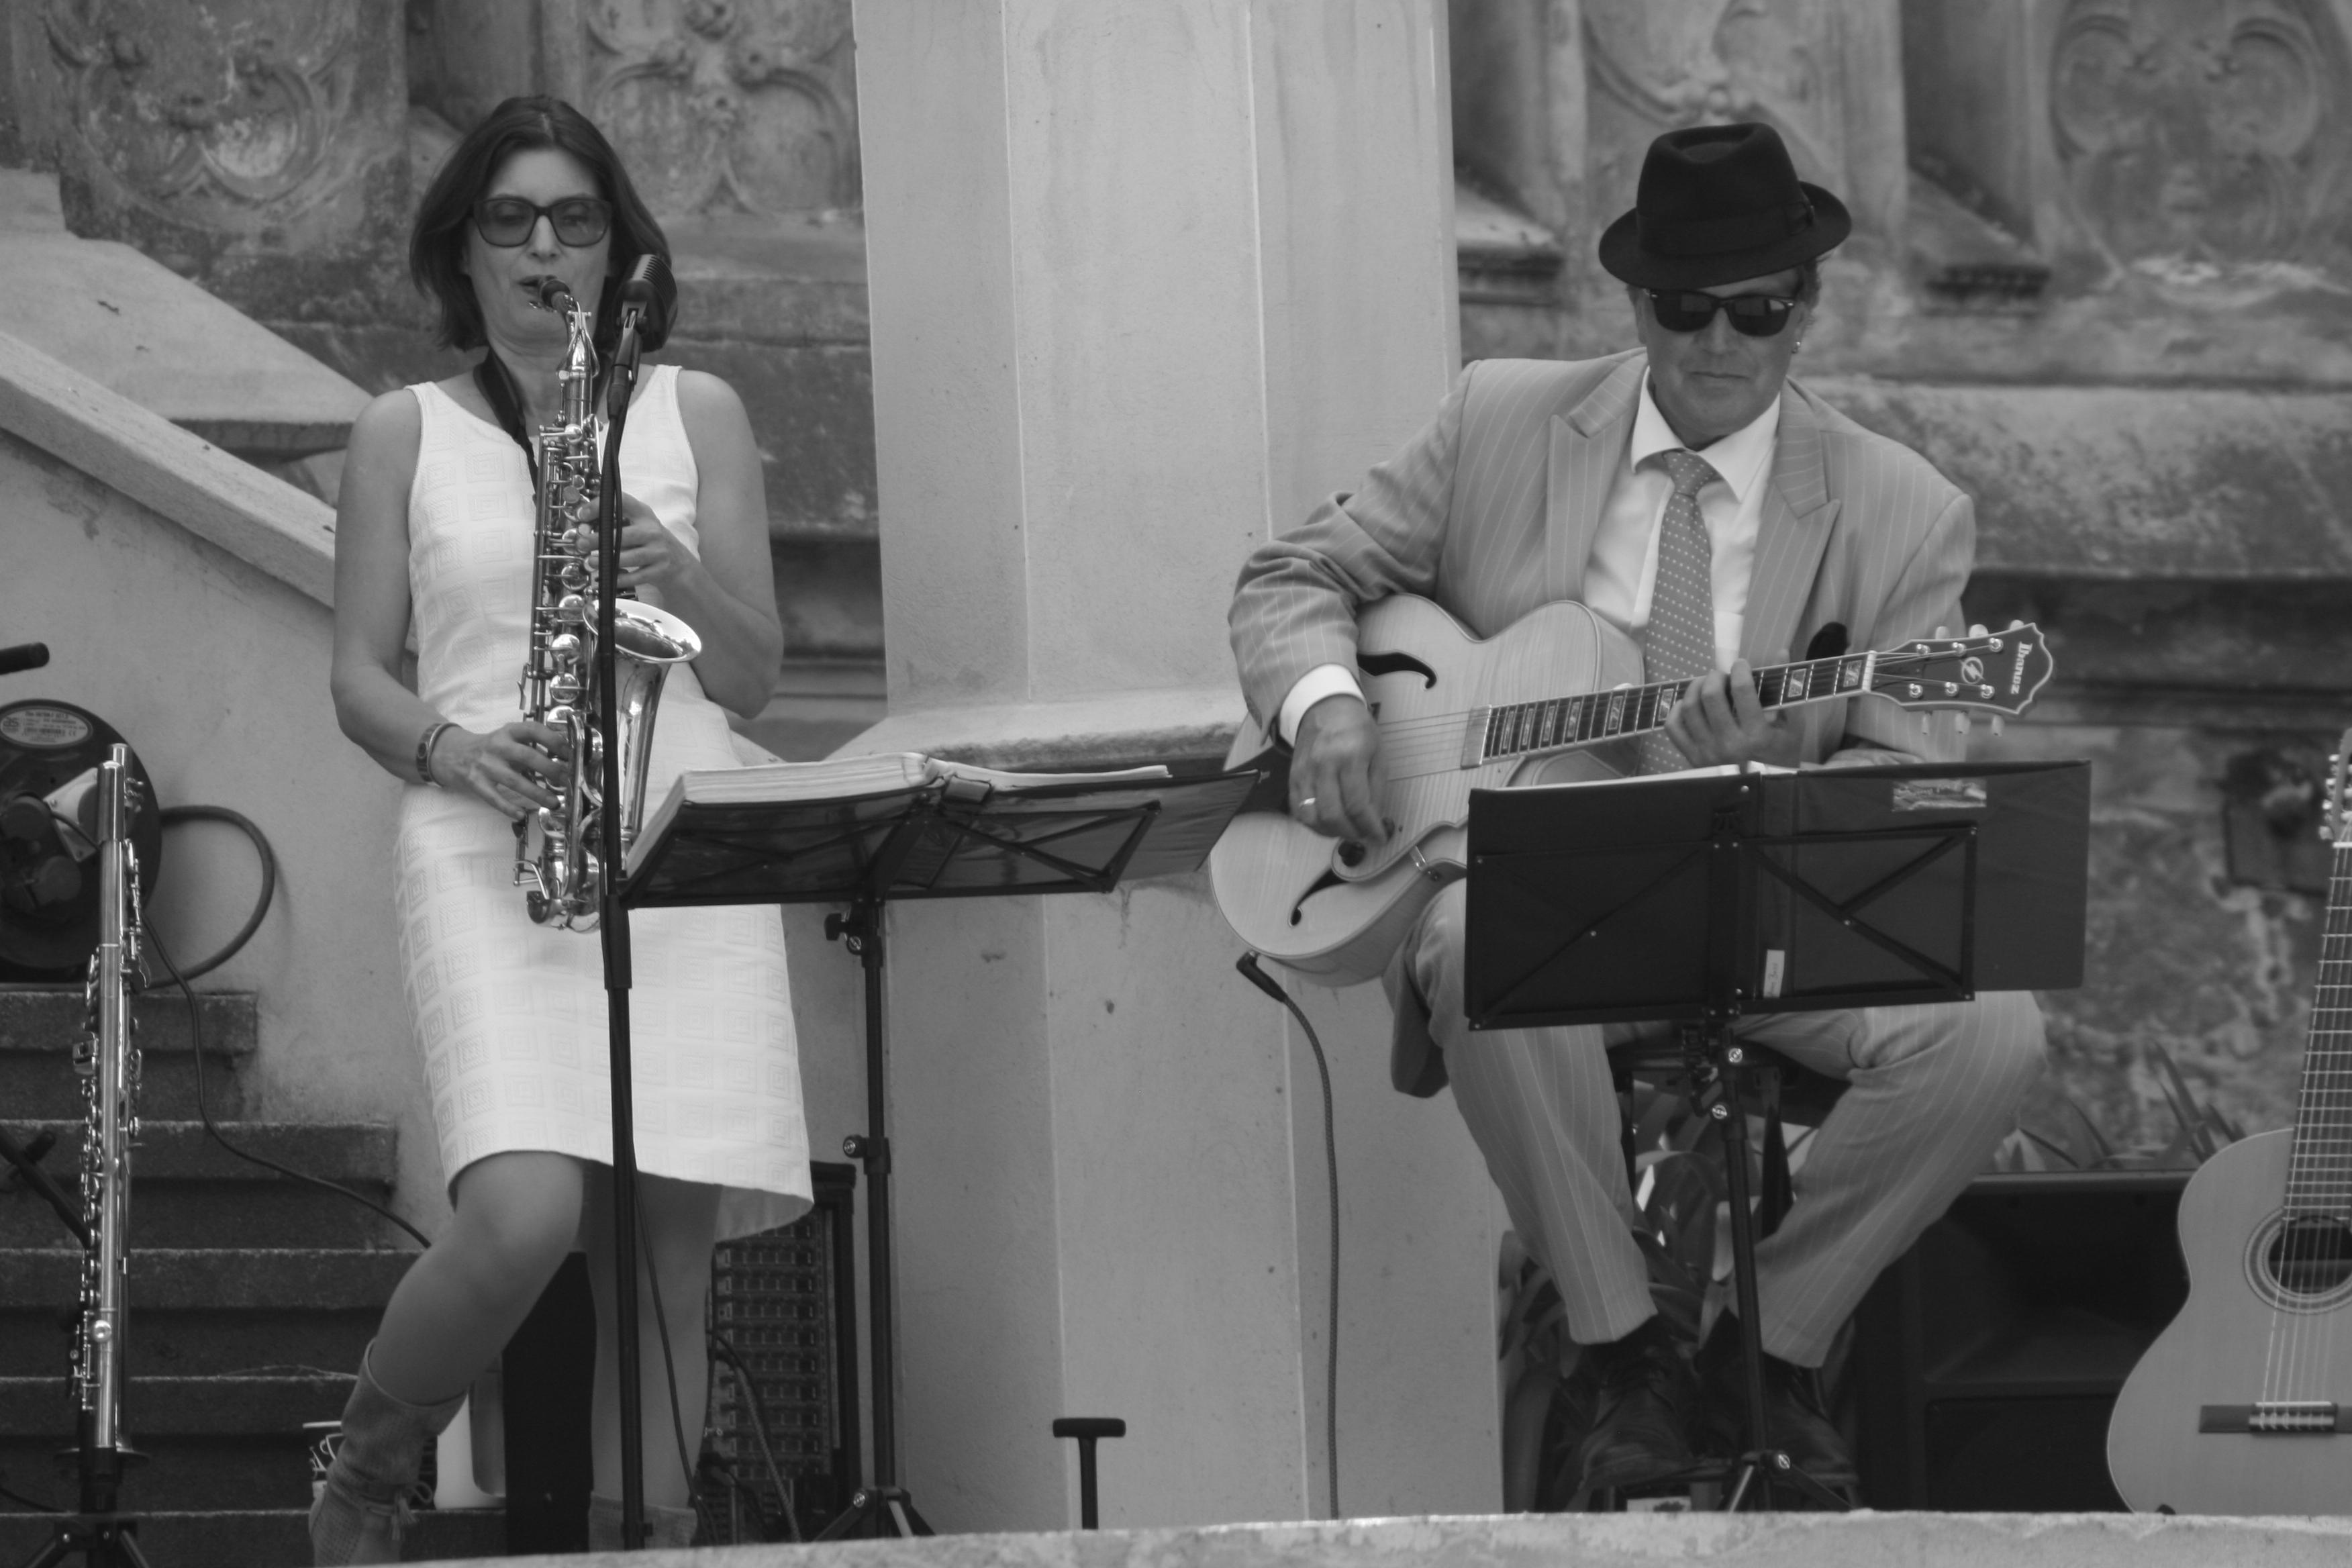 Pressebild Duo Swing for_ Fun